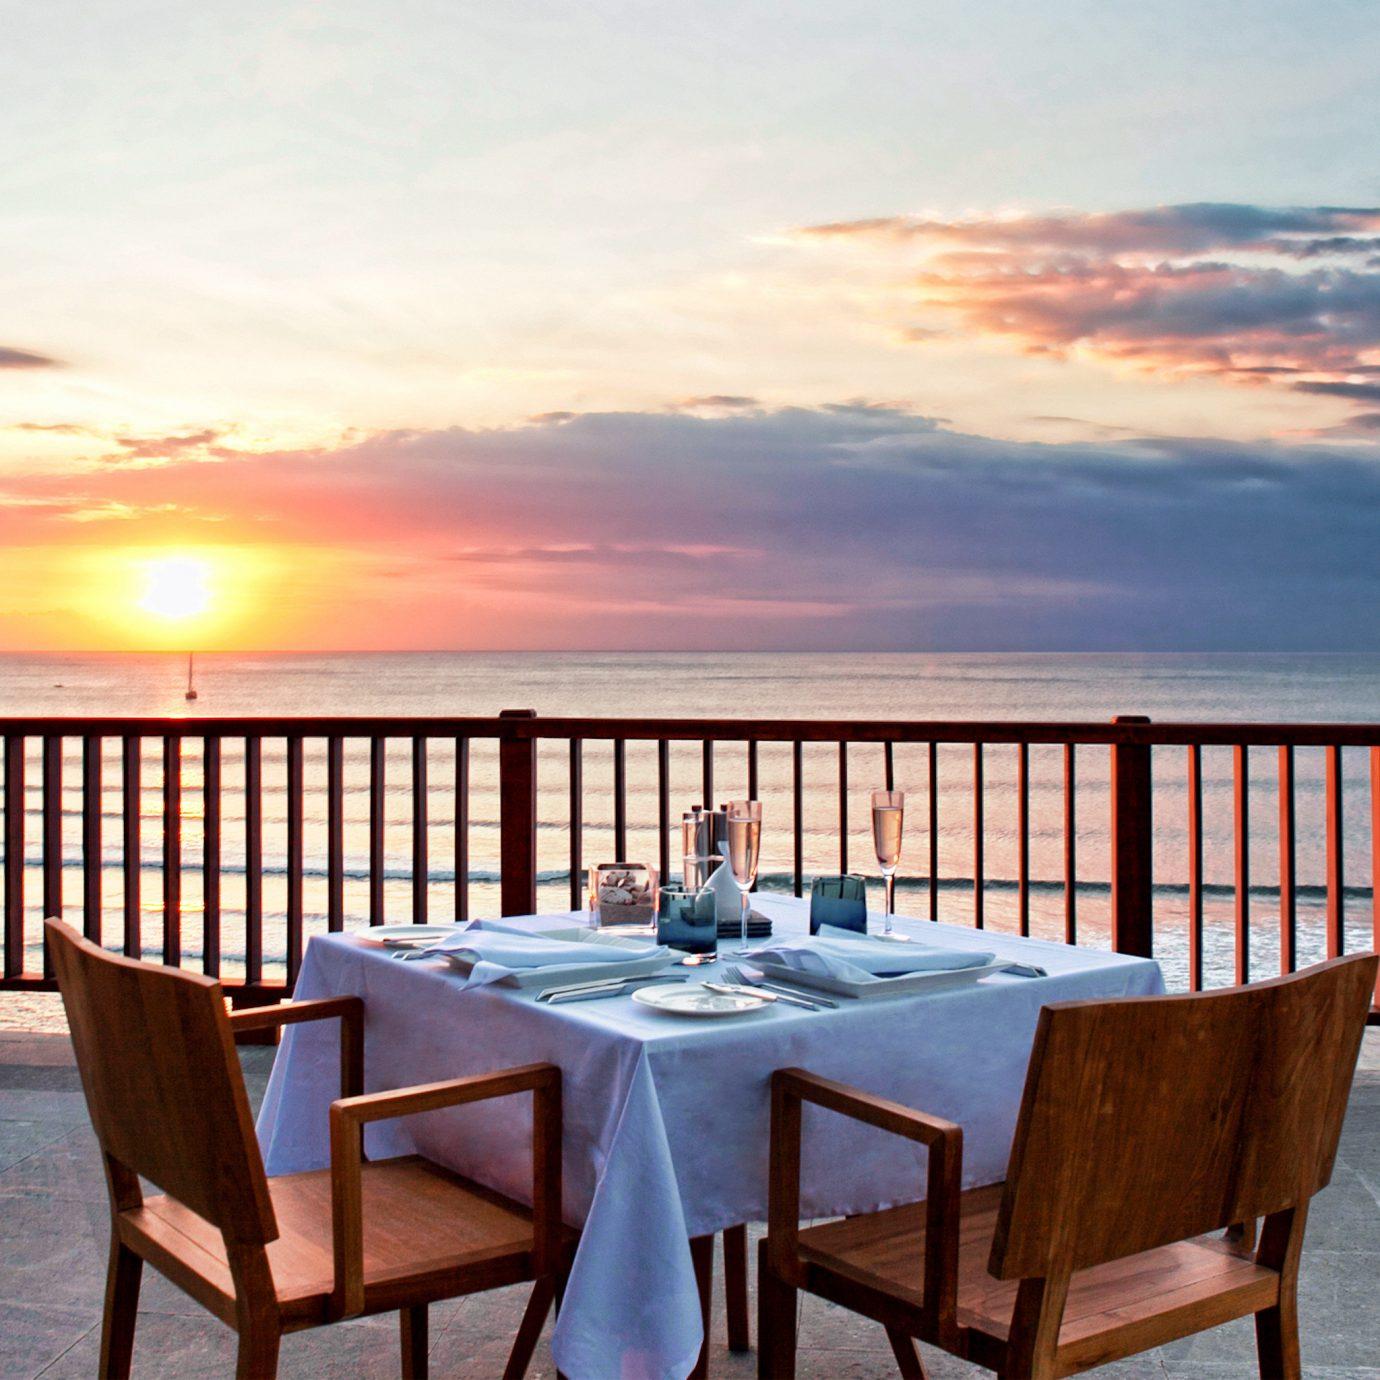 Bar Beachfront Dining Drink Eat Nightlife Scenic views sky chair water property Ocean overlooking Resort set dining table